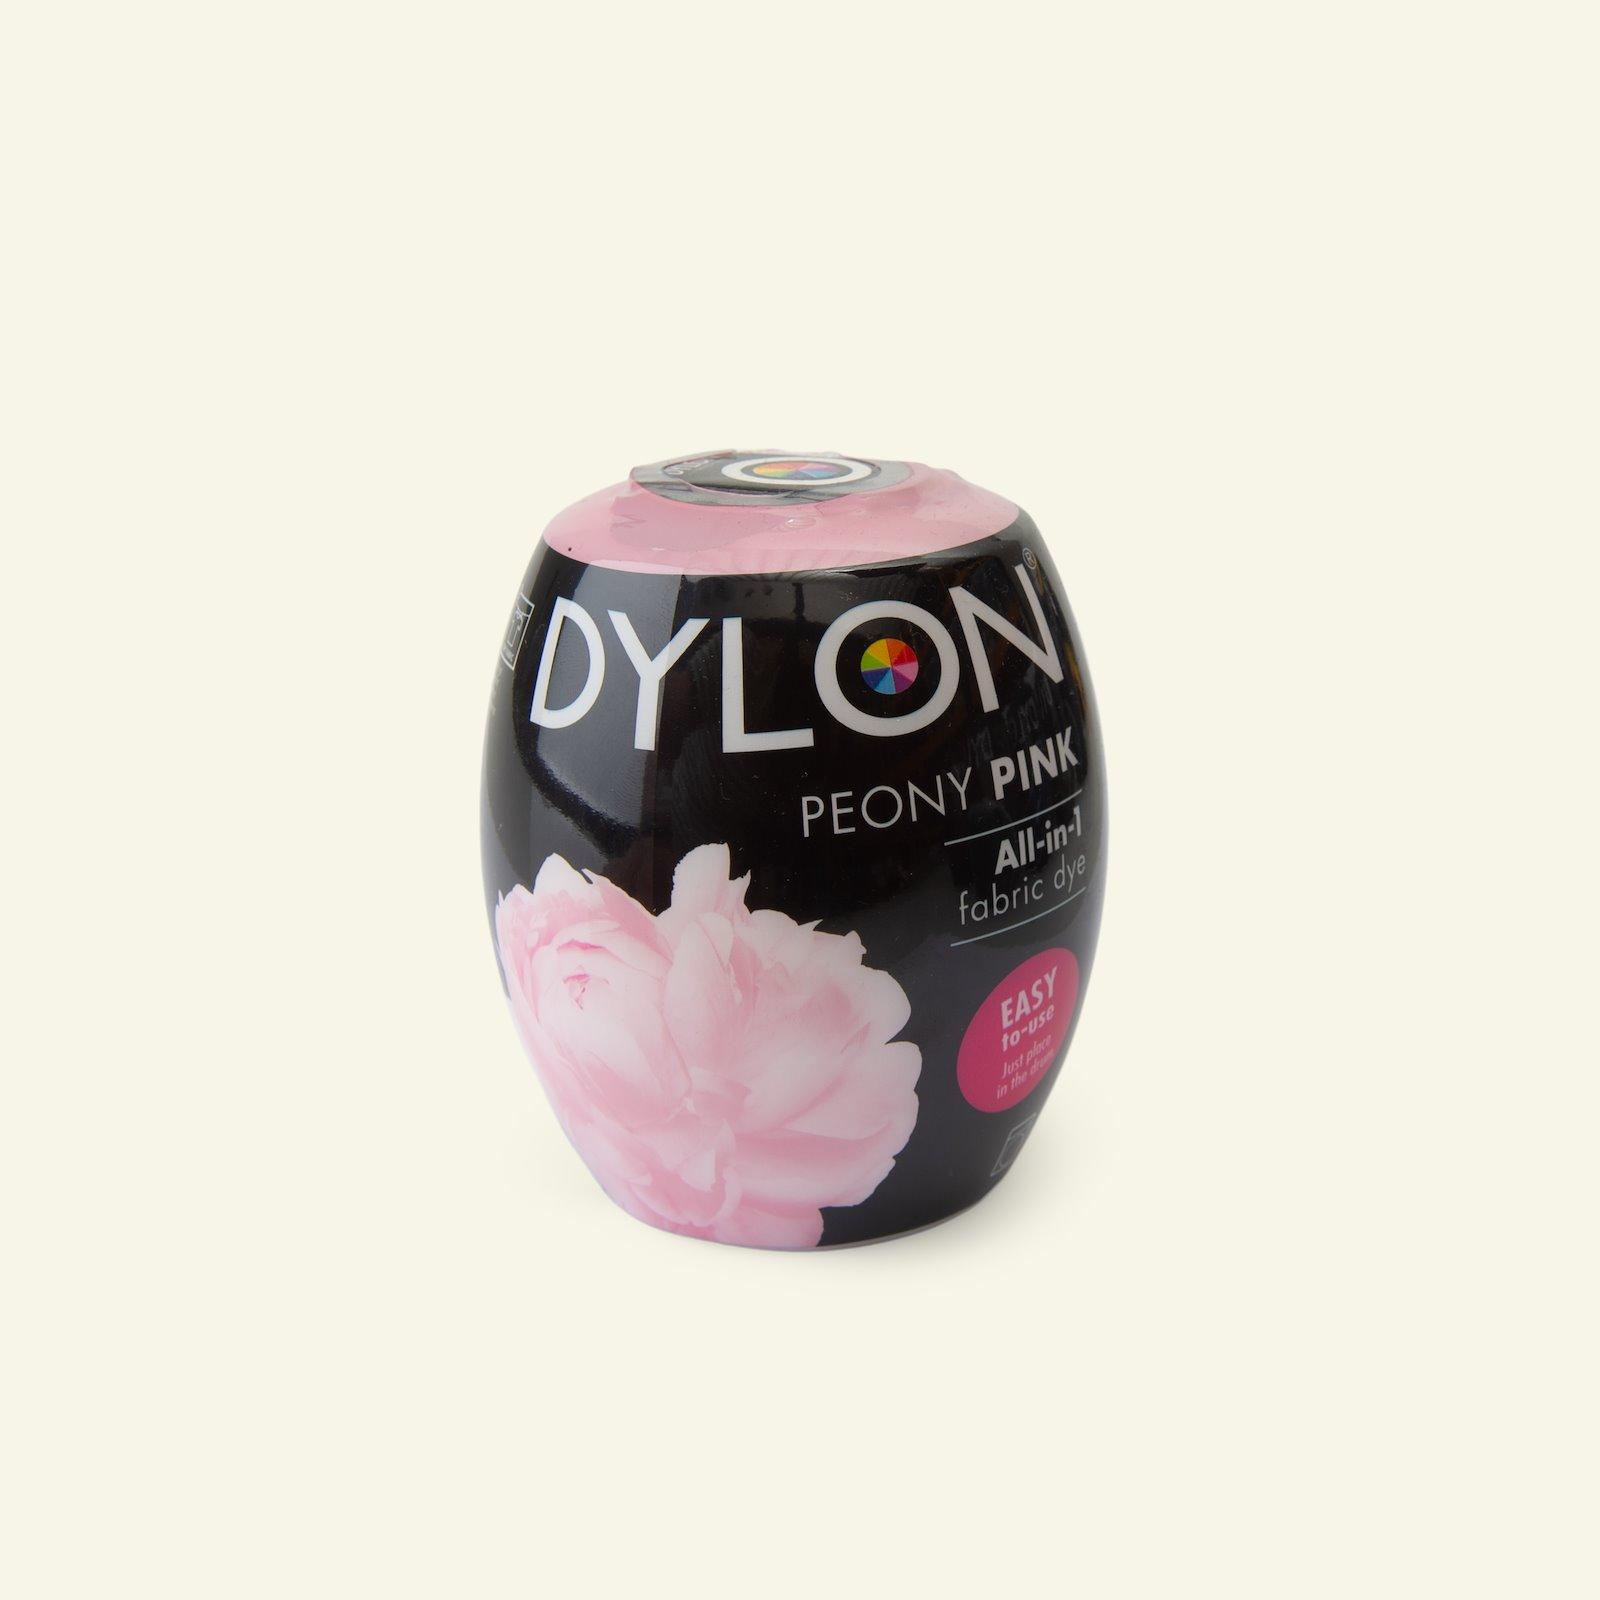 Dylon fabric dye for machine pink 29702_pack_b